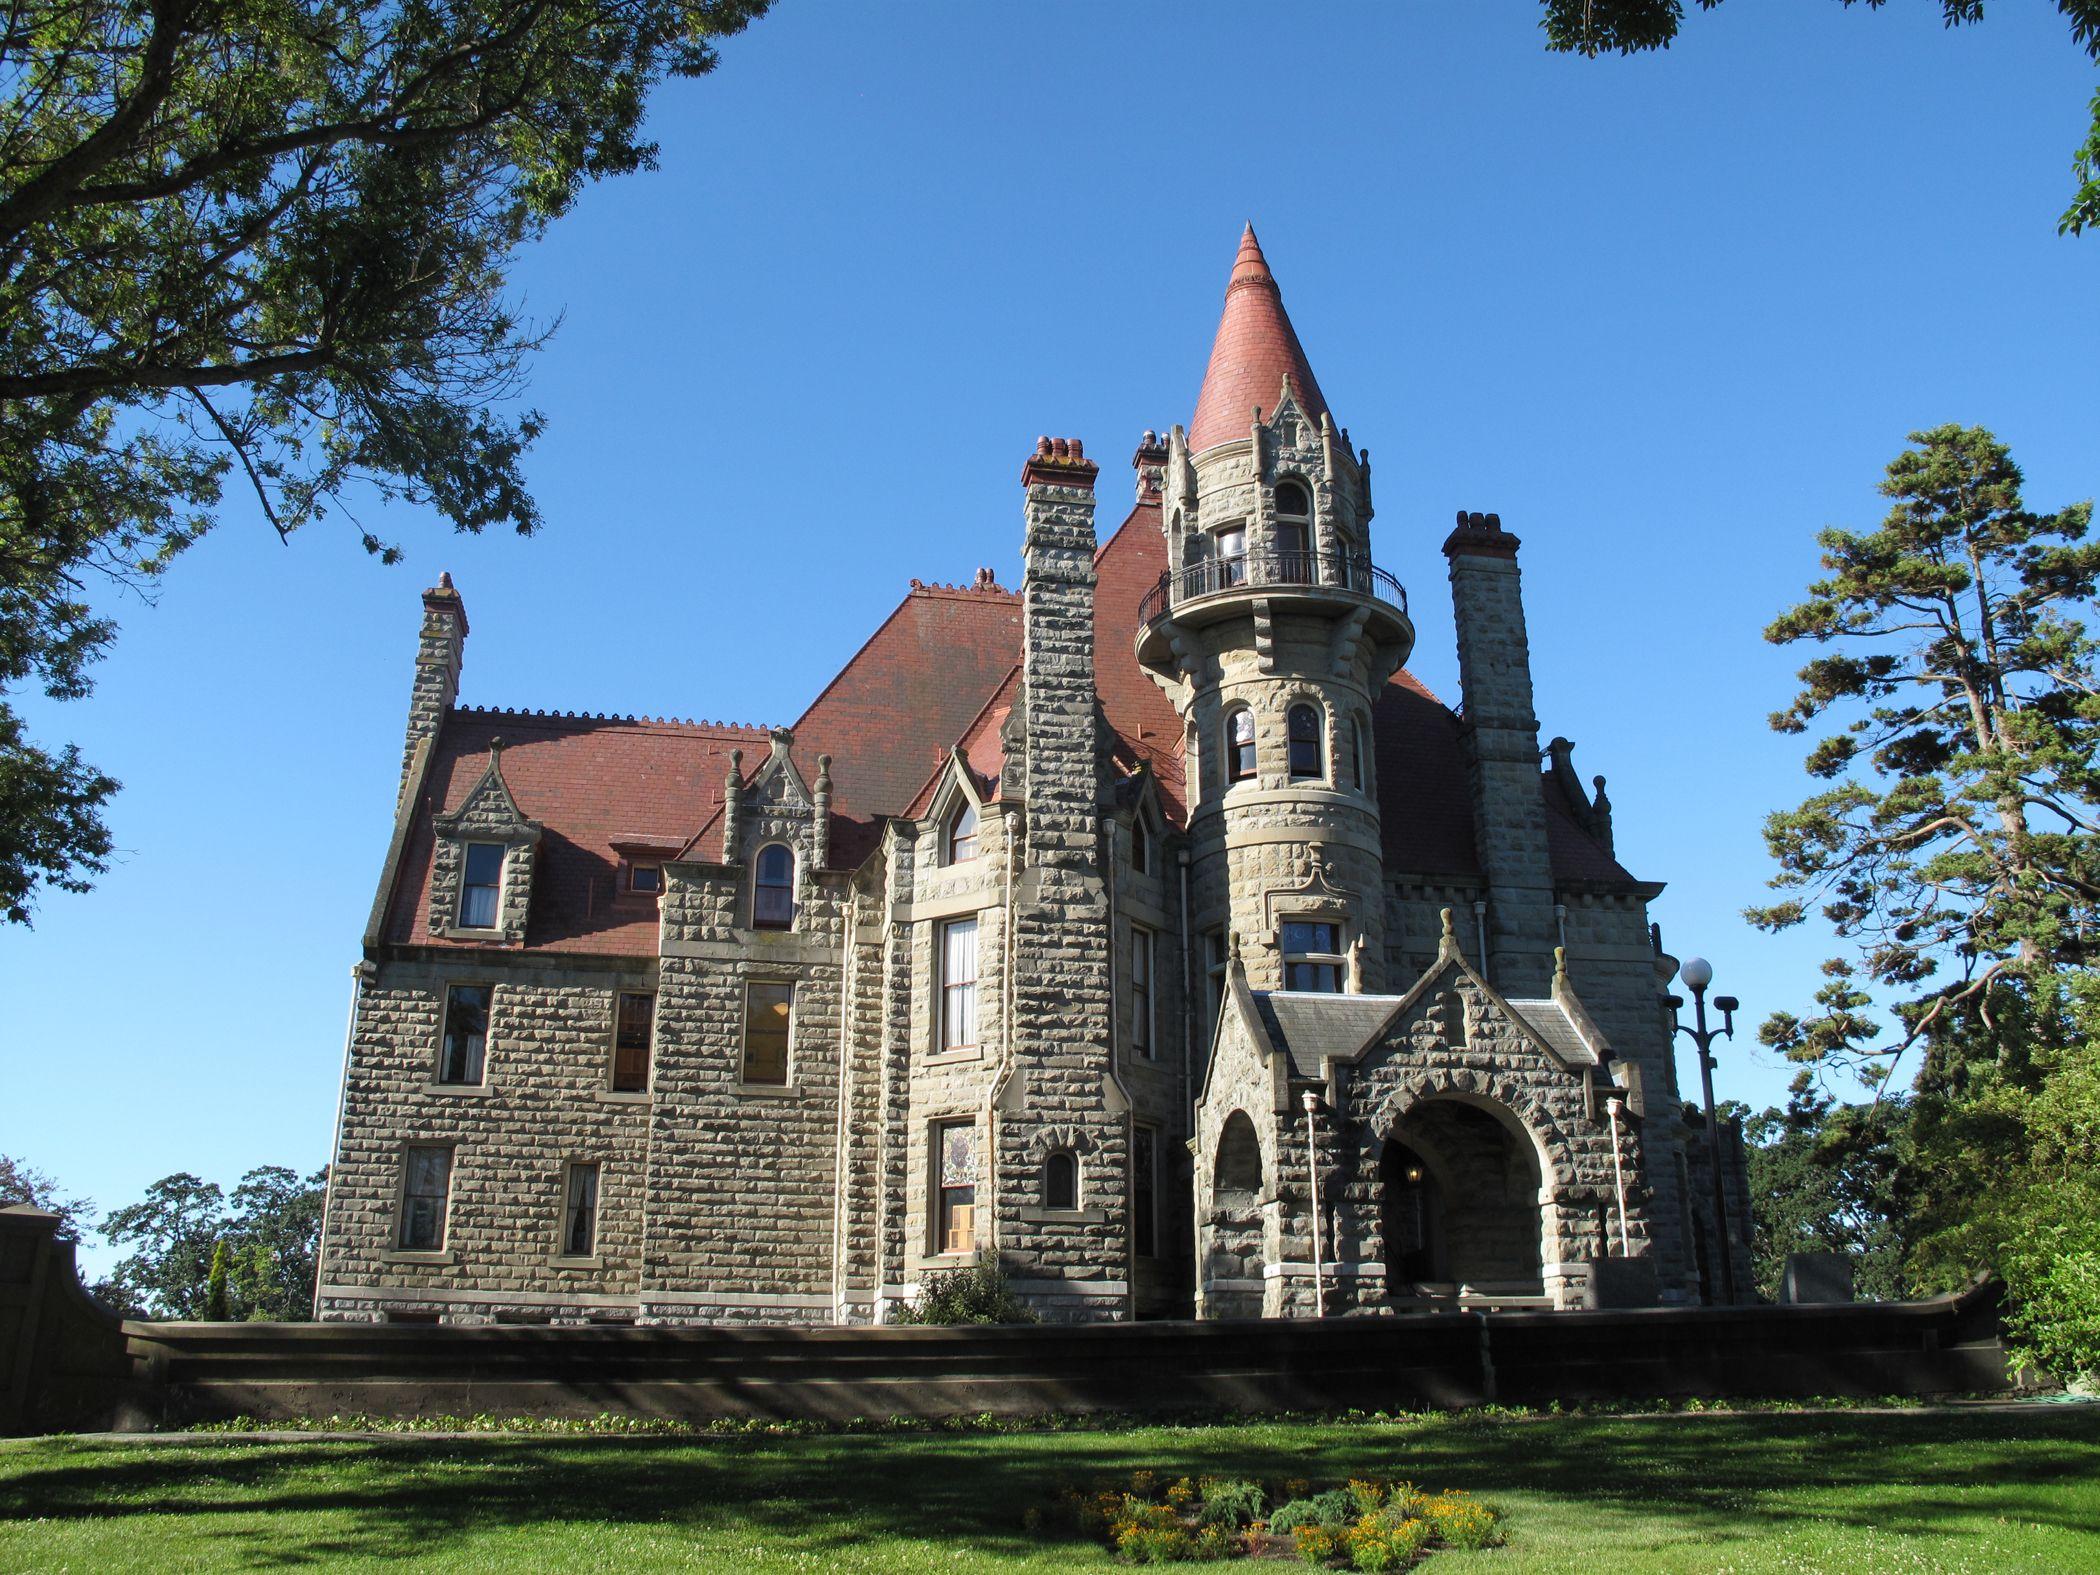 craigdarroch castle - Google Search